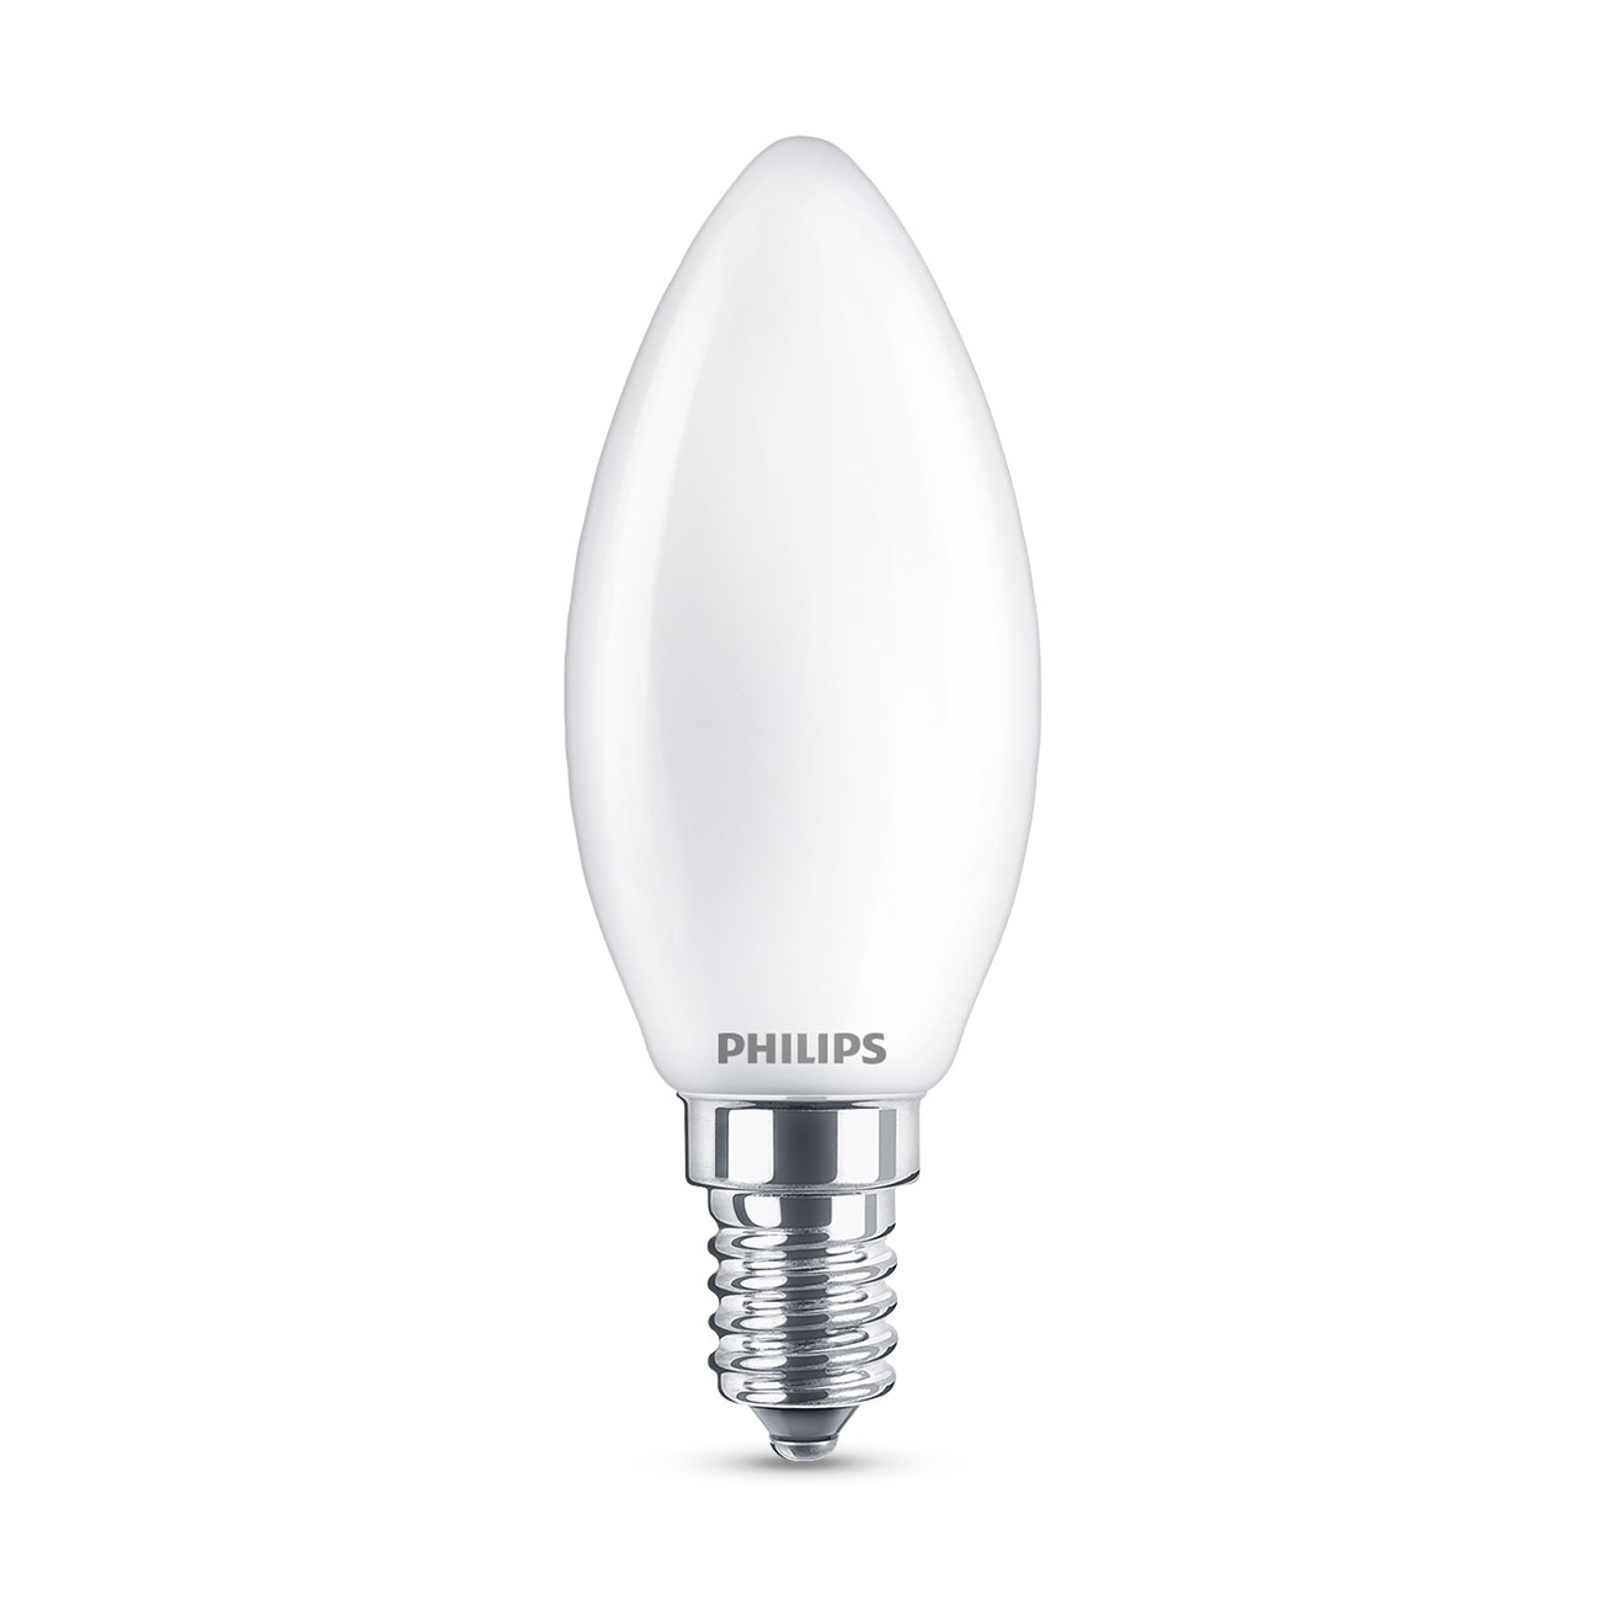 Philips Classic LED-Lampe E14 B35 6,5W 2.700K matt